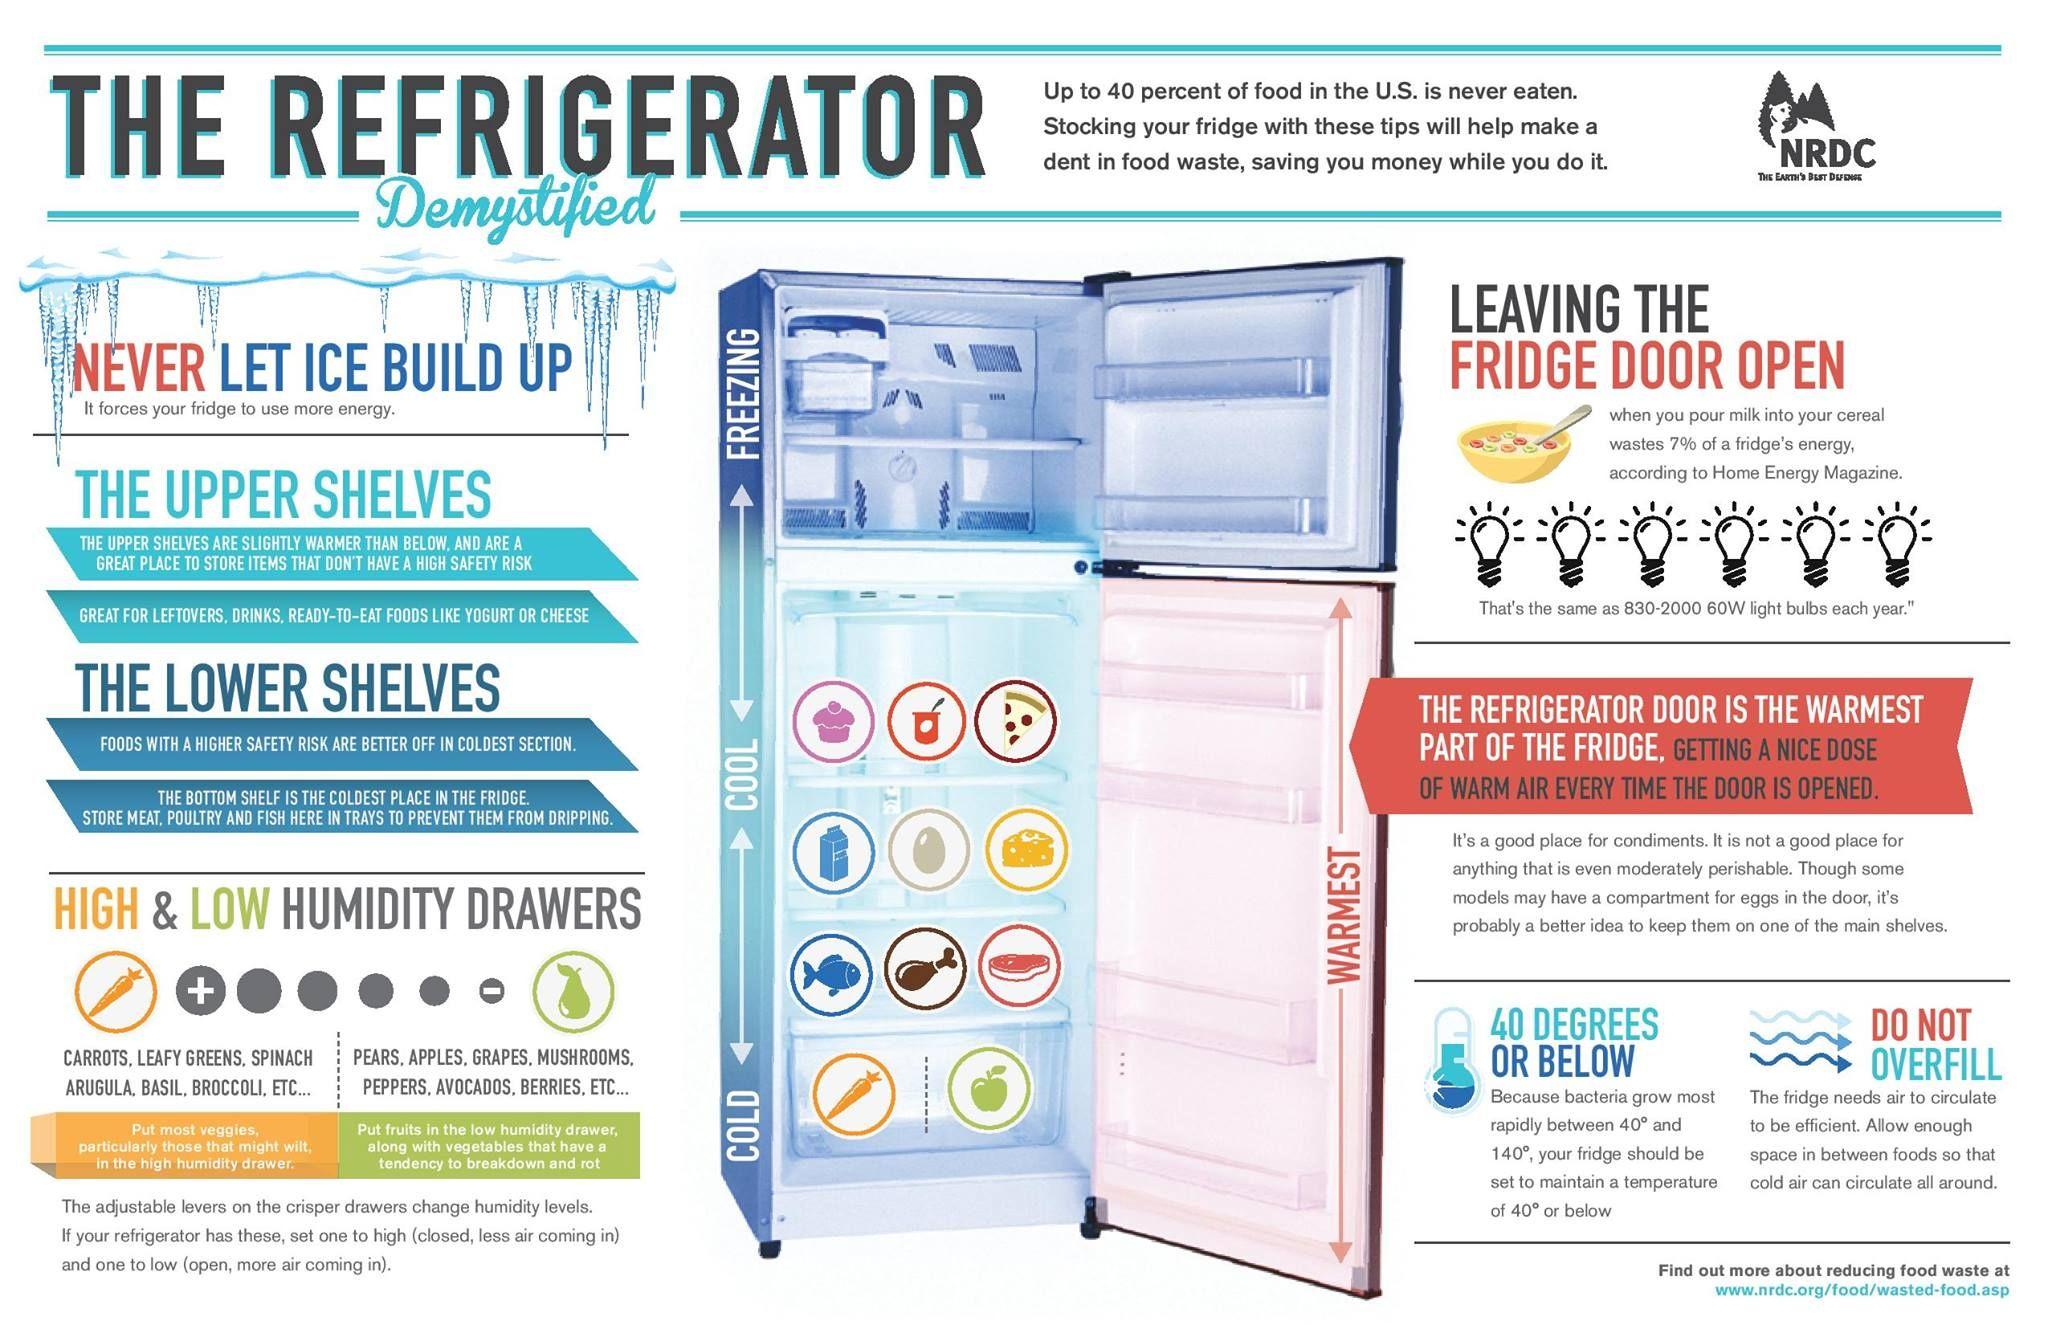 Refrigerator Demystified Preventing Food Waste Food